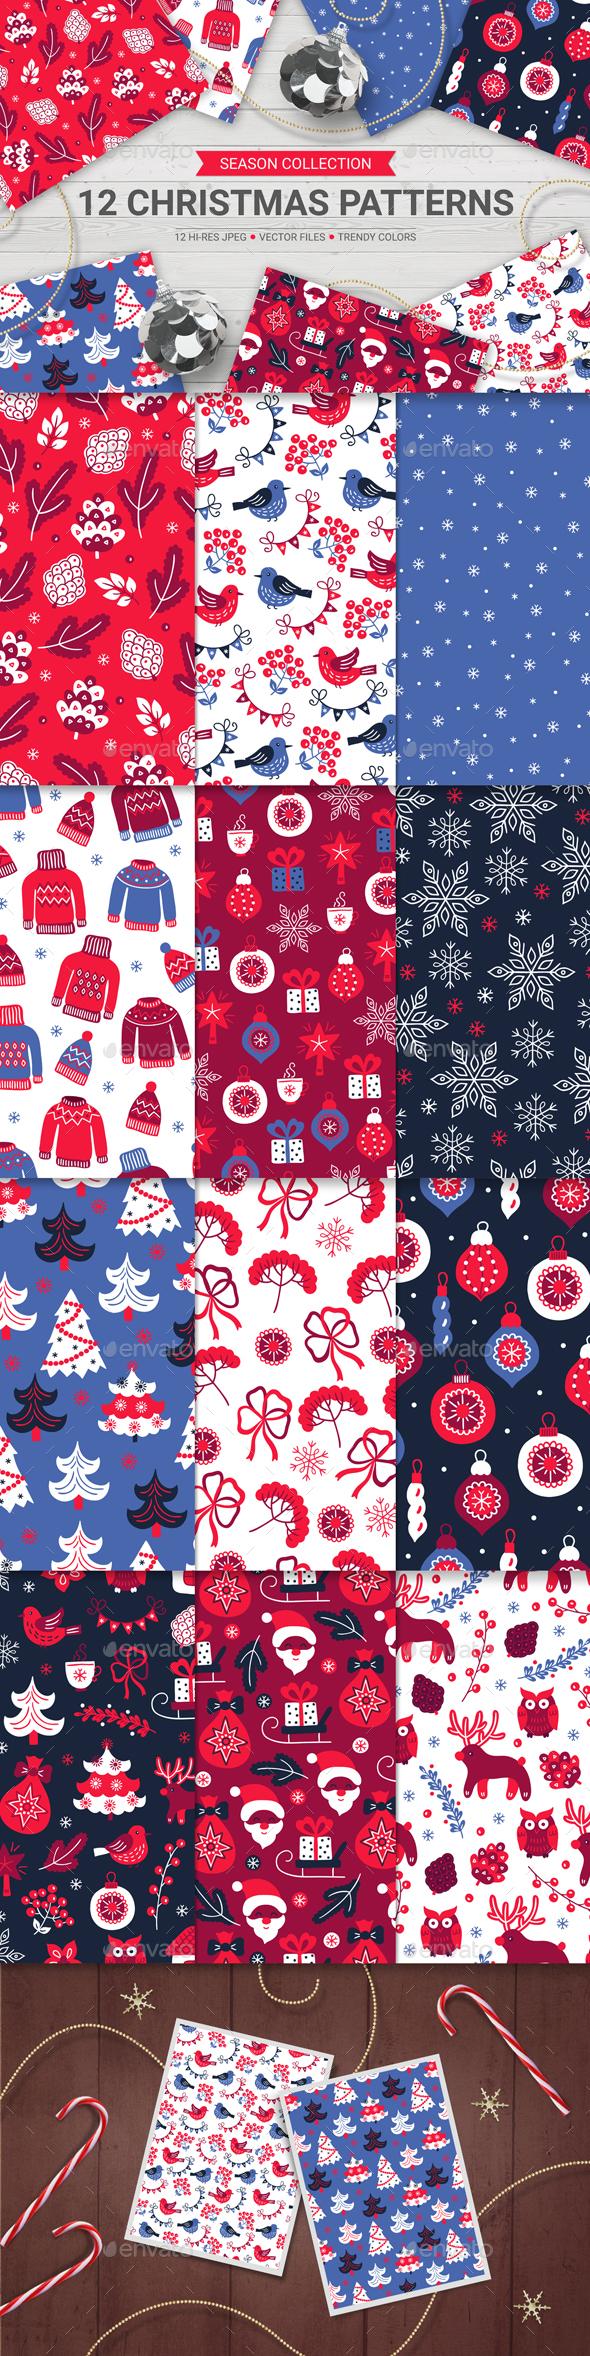 12 Christmas Seamless Patterns - Christmas Seasons/Holidays